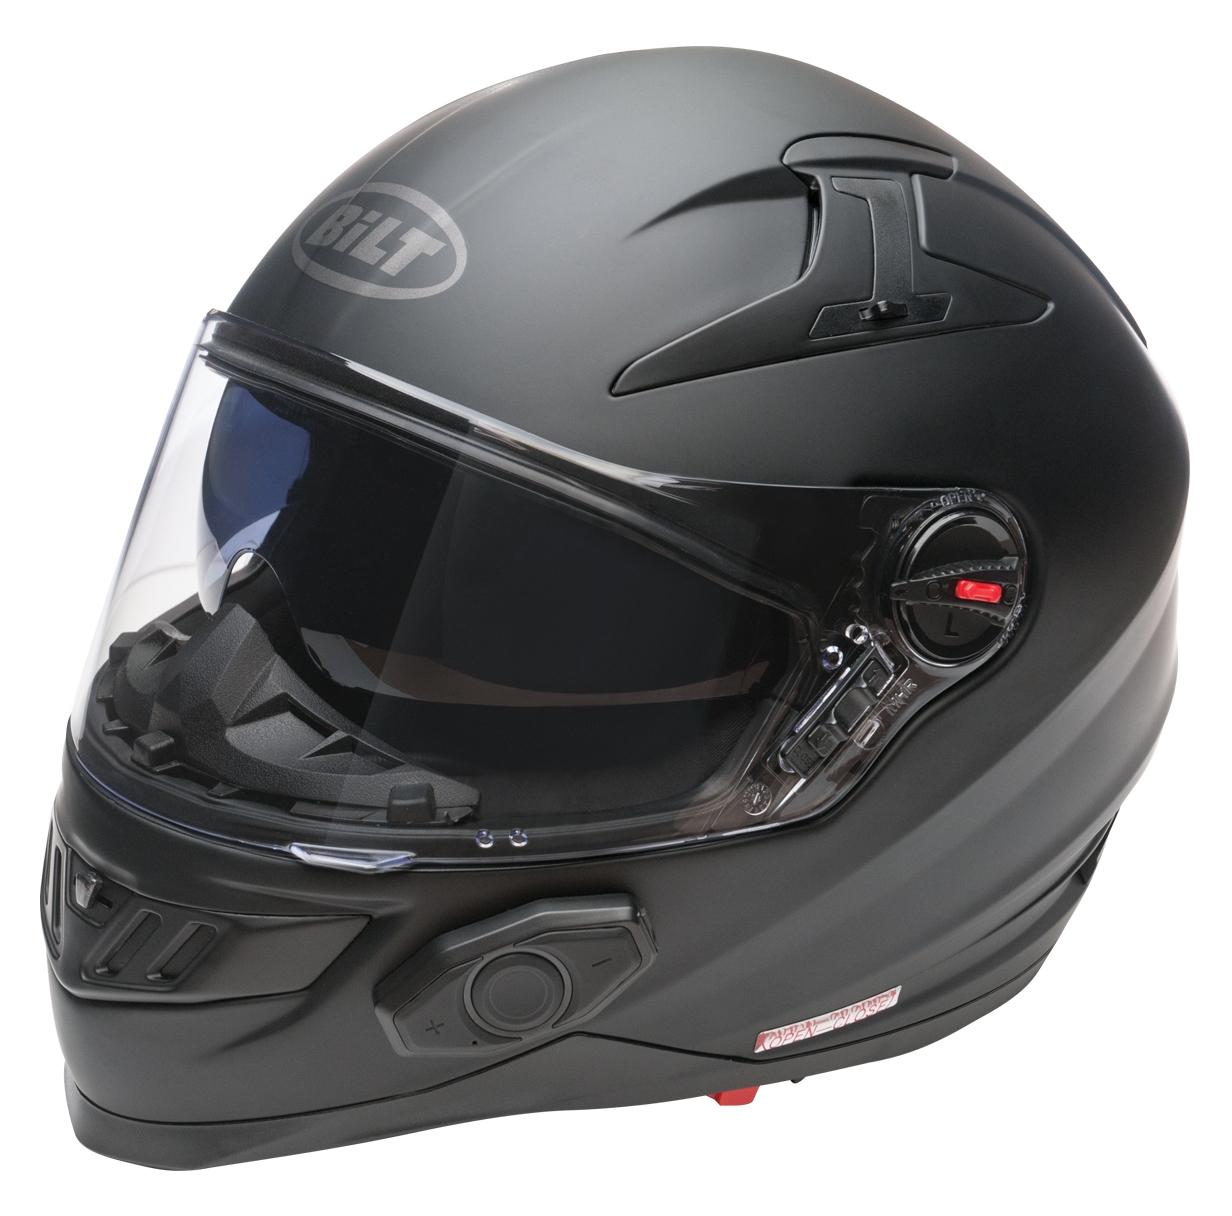 Bilt Techno 2.0 Sena Bluetooth Helmet - Cycle Gear